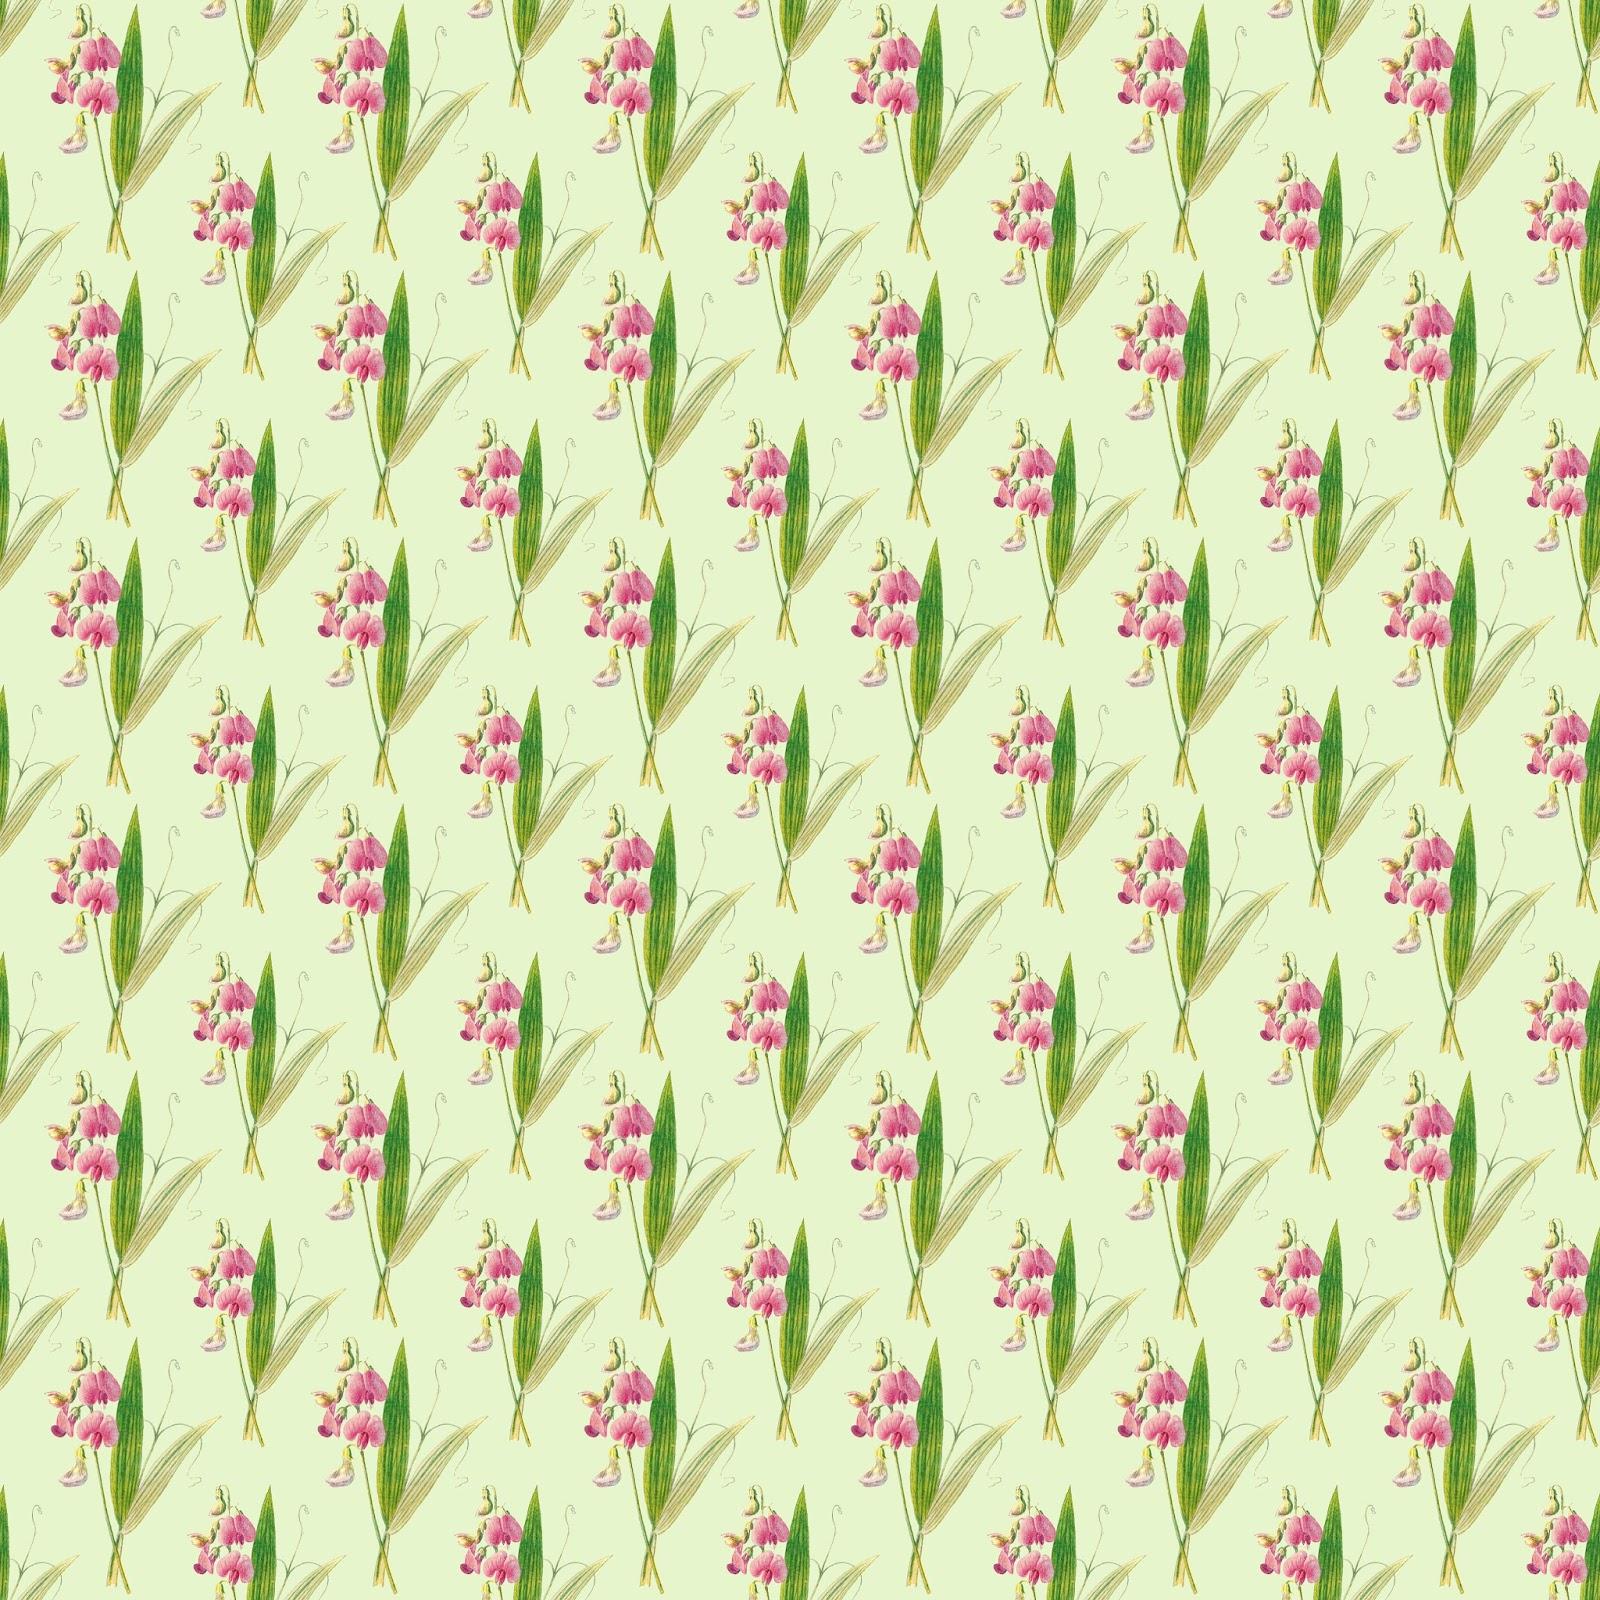 Scrapbook paper design - Digital Artist Paper Wildflower Design Scrapbook Flower Clip Art